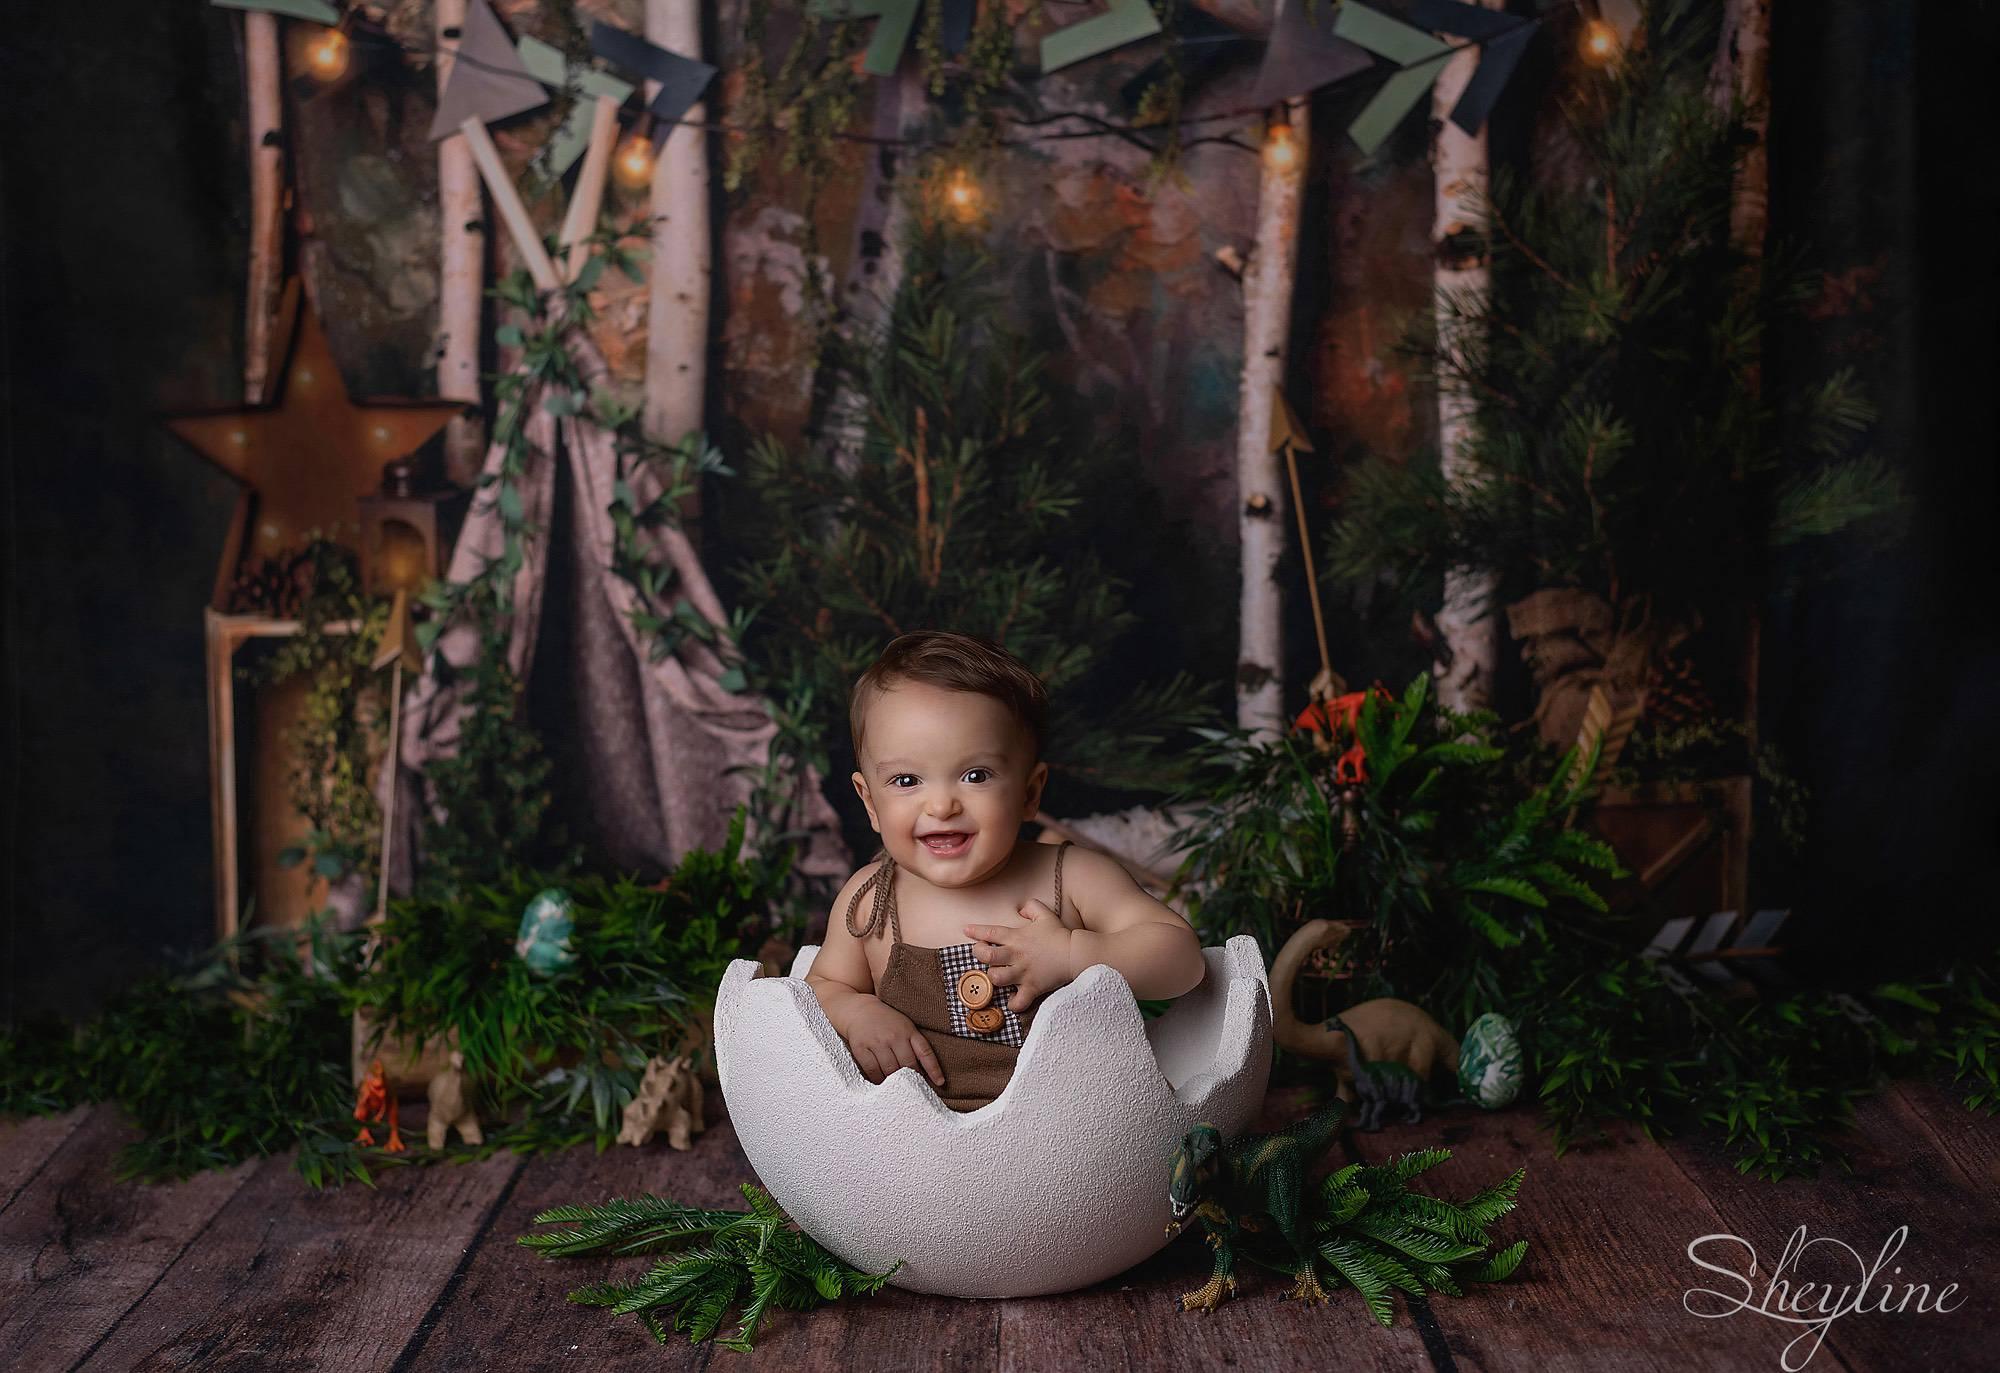 Photographe enfant famille poitiers 86 vienne sheyline photography